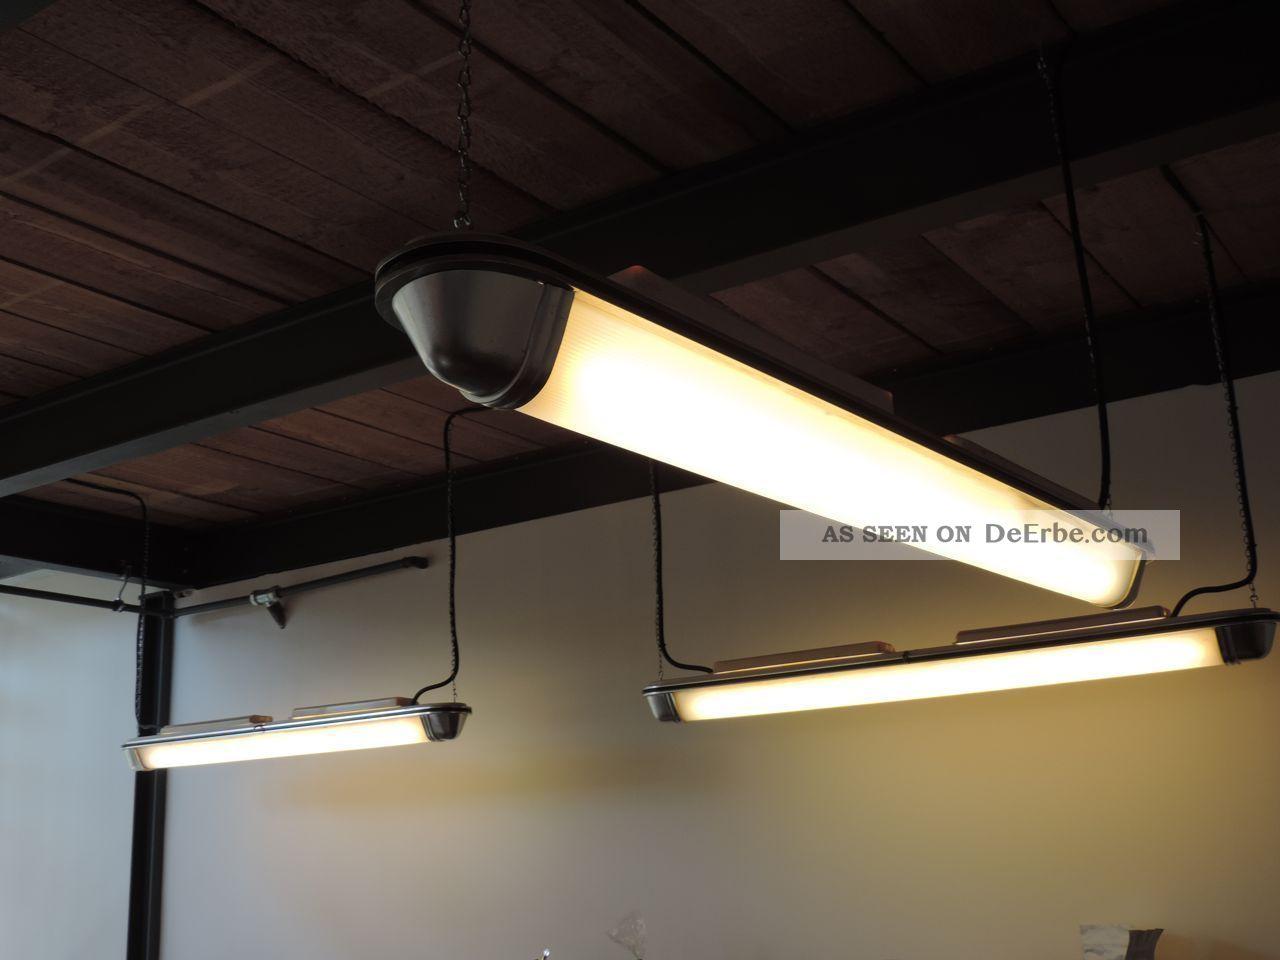 u bahn lampe loft bauhaus art deco industrielampe berlin mauer fabriklampe. Black Bedroom Furniture Sets. Home Design Ideas